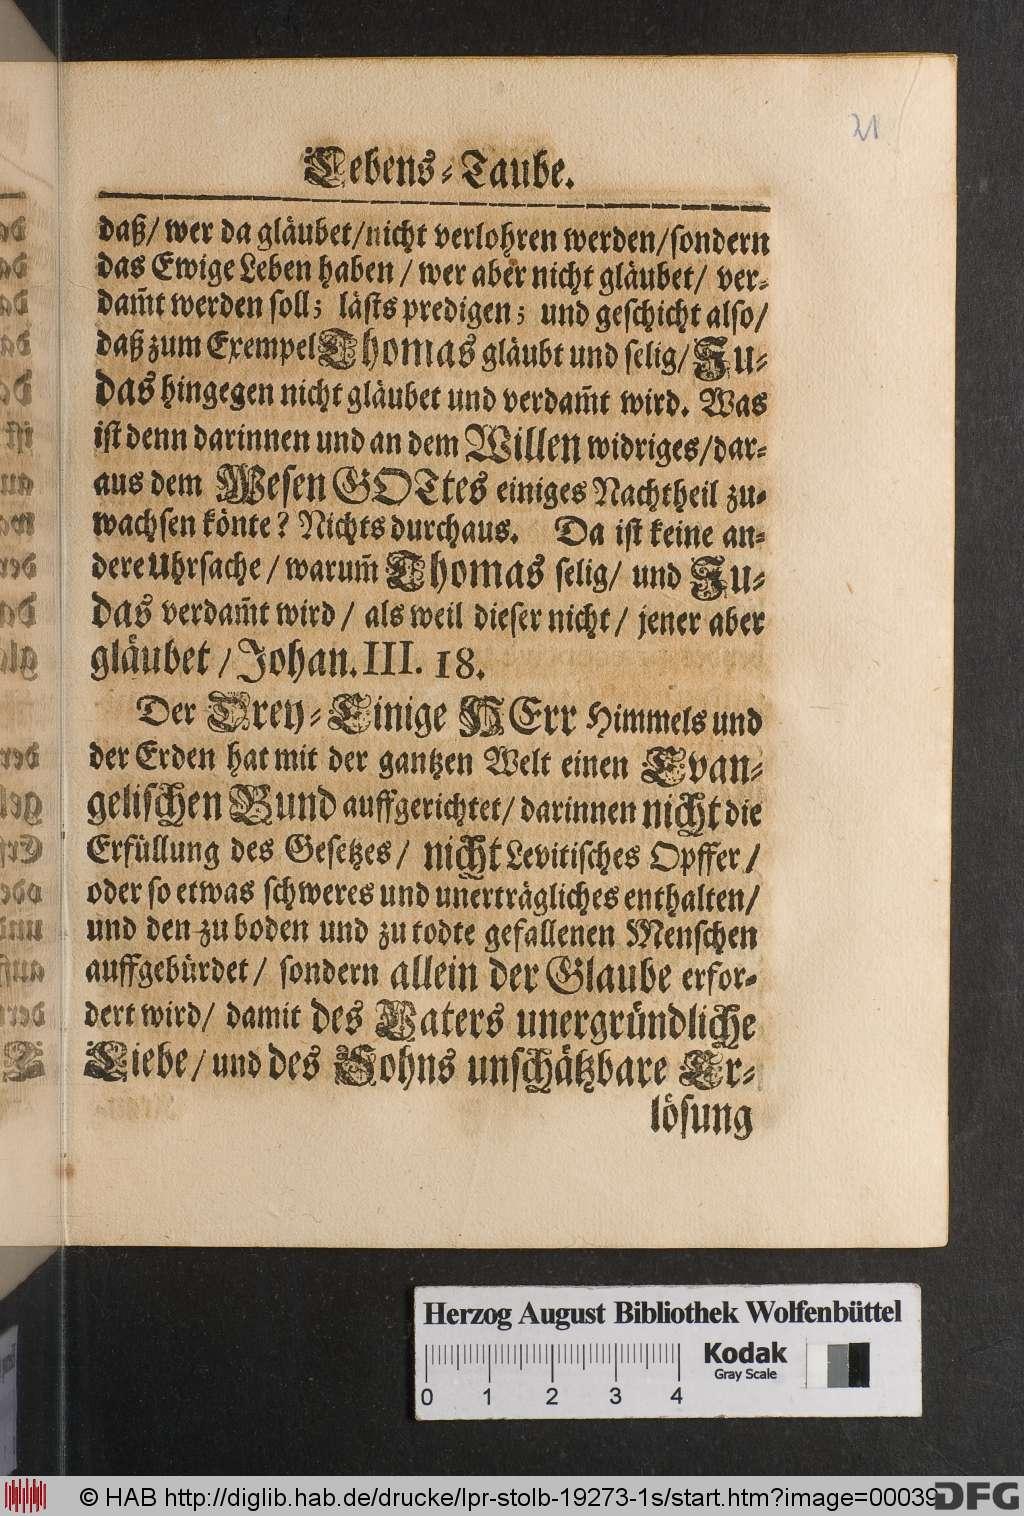 http://diglib.hab.de/drucke/lpr-stolb-19273-1s/00039.jpg